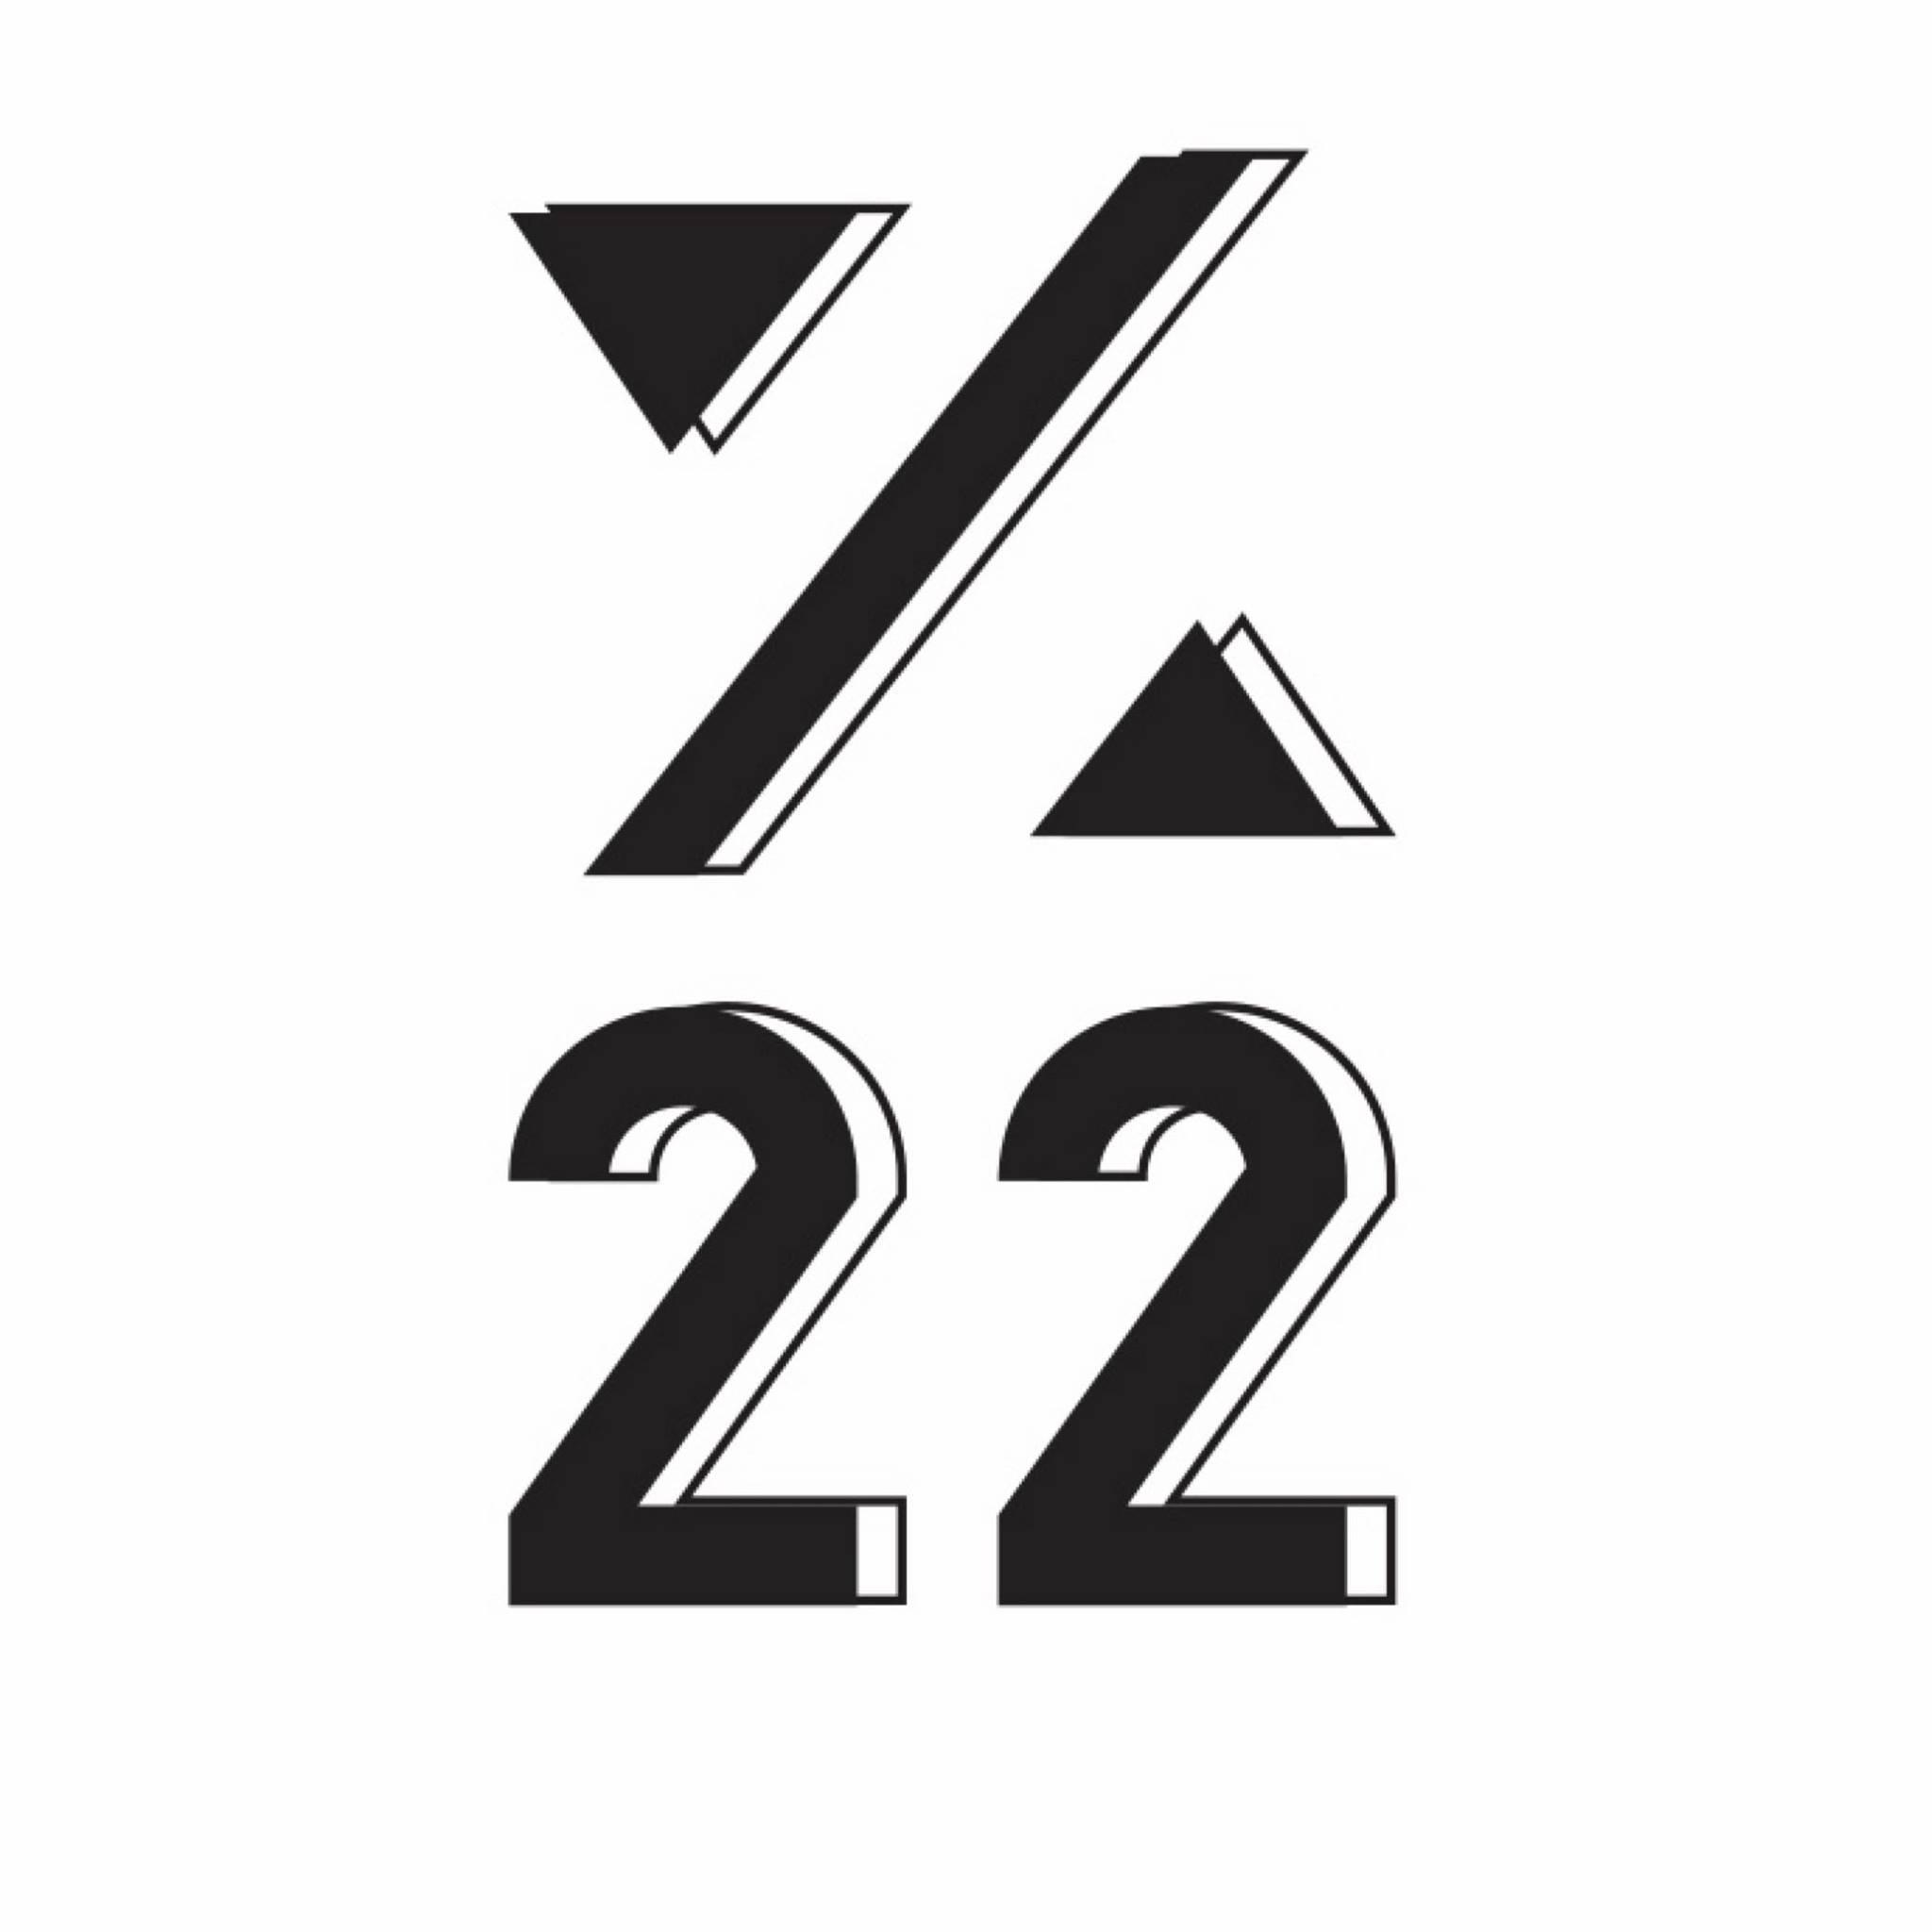 %22 Premium Smoothie & Tea logo